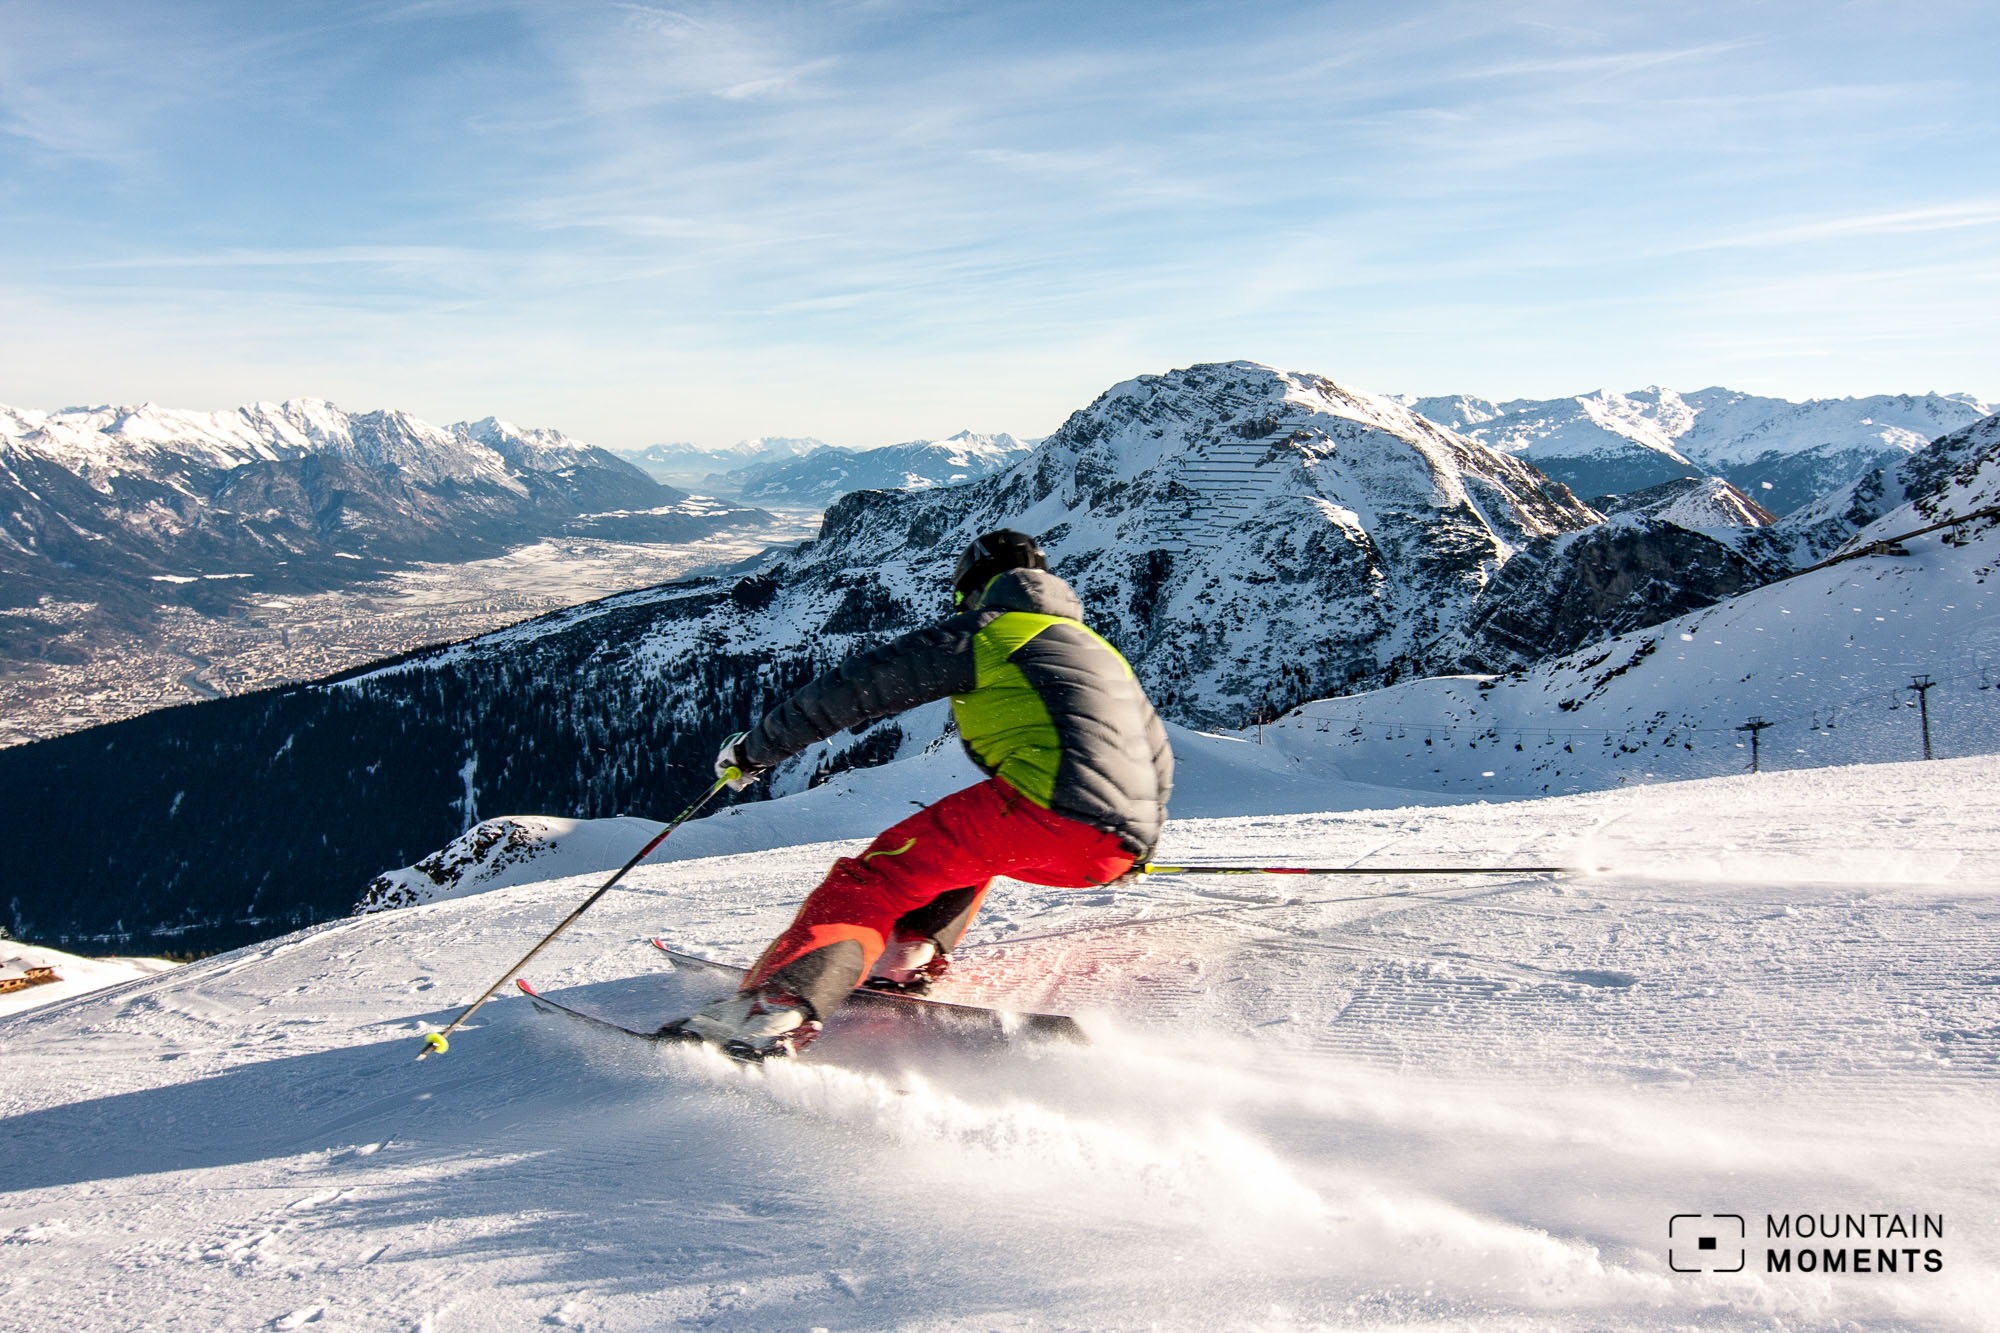 Skigebiet Axamer Lizum: Das abwechslungsreiche Skigebiet Nahe an der Stadt Innsbruck.